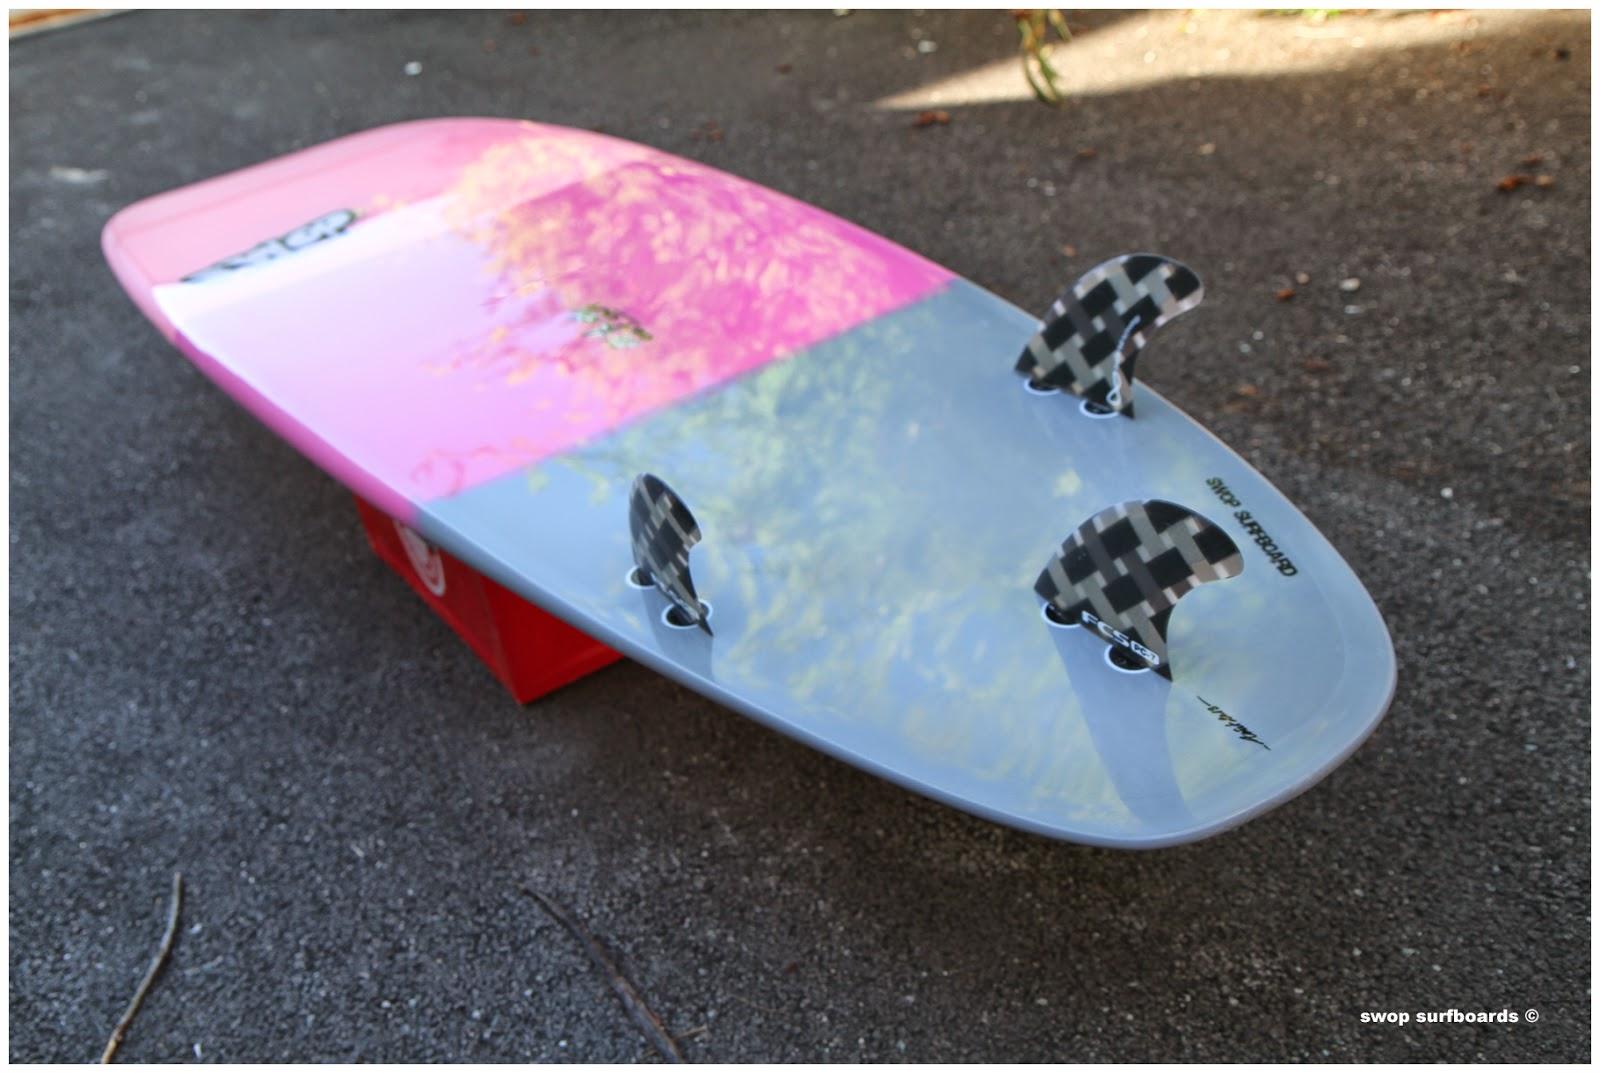 swop surfboards 6 39 3 sluggy resine teintee. Black Bedroom Furniture Sets. Home Design Ideas